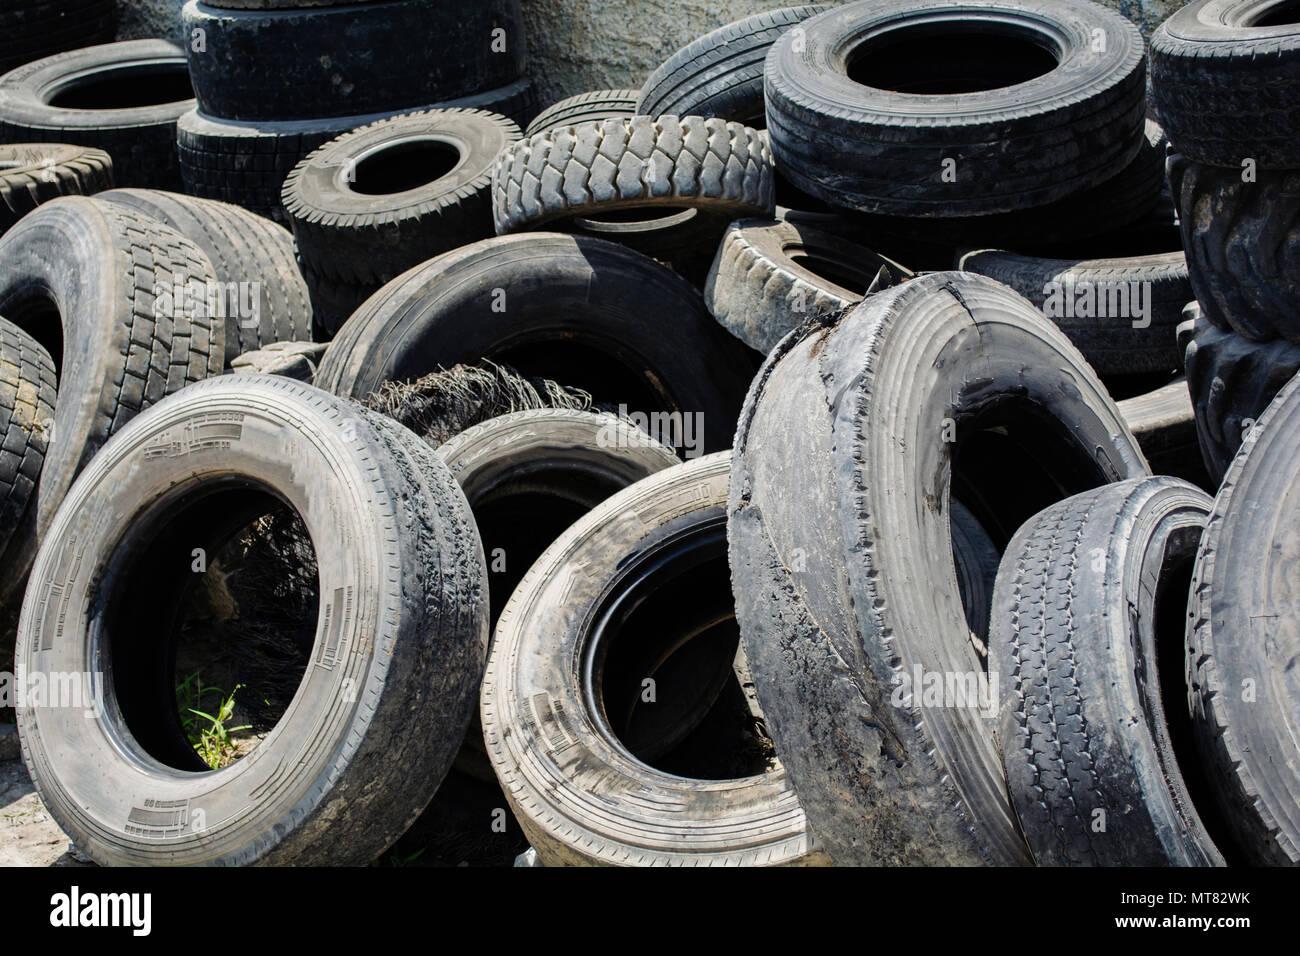 used car tires pile in the tire repair shop yard - Stock Image